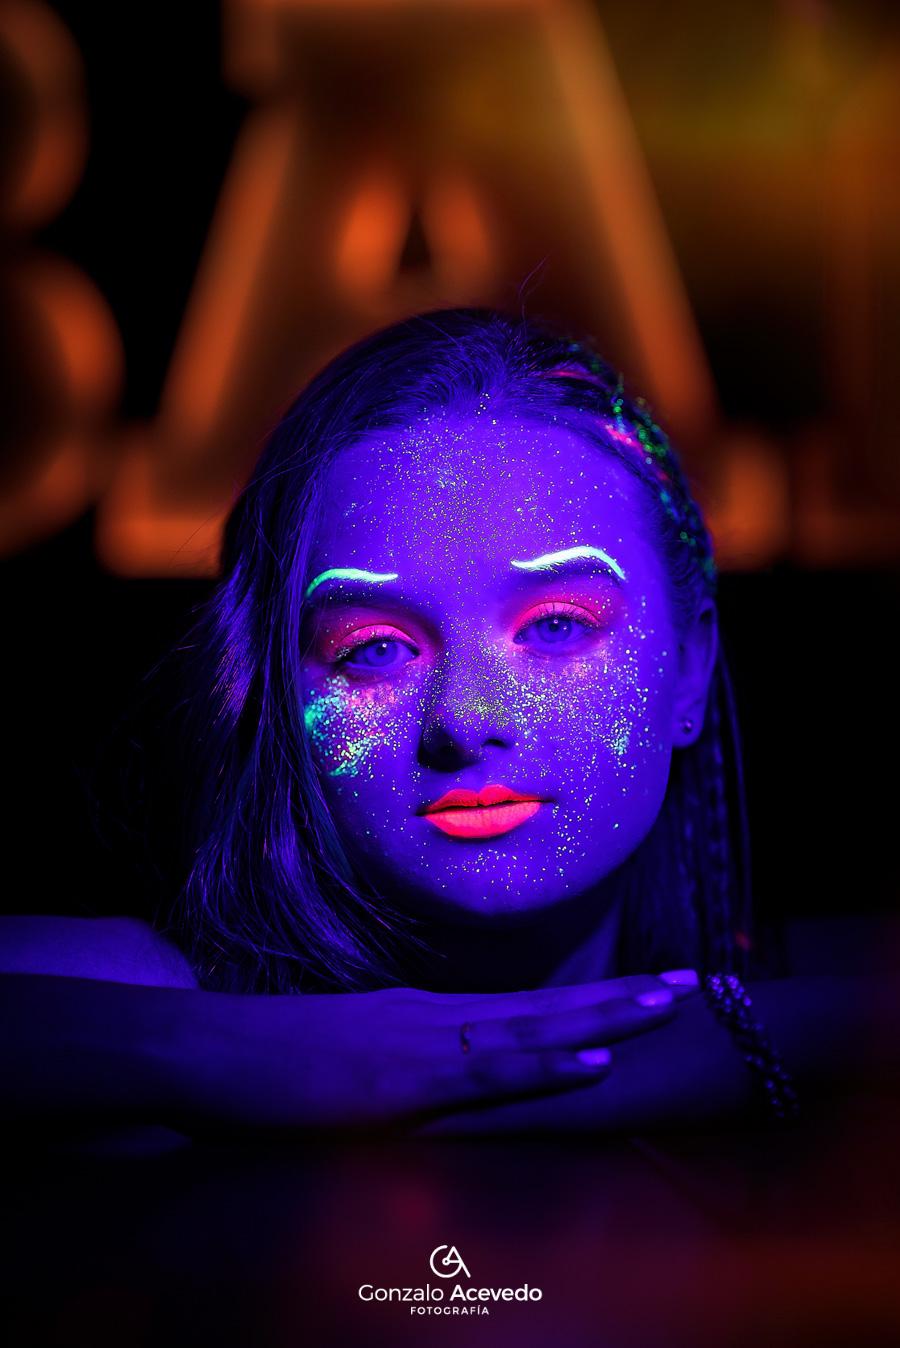 Book de 15 Fluor neon con actitud unico y diferente idea Gonzalo Acevedo #gonzaloacevedofotografia